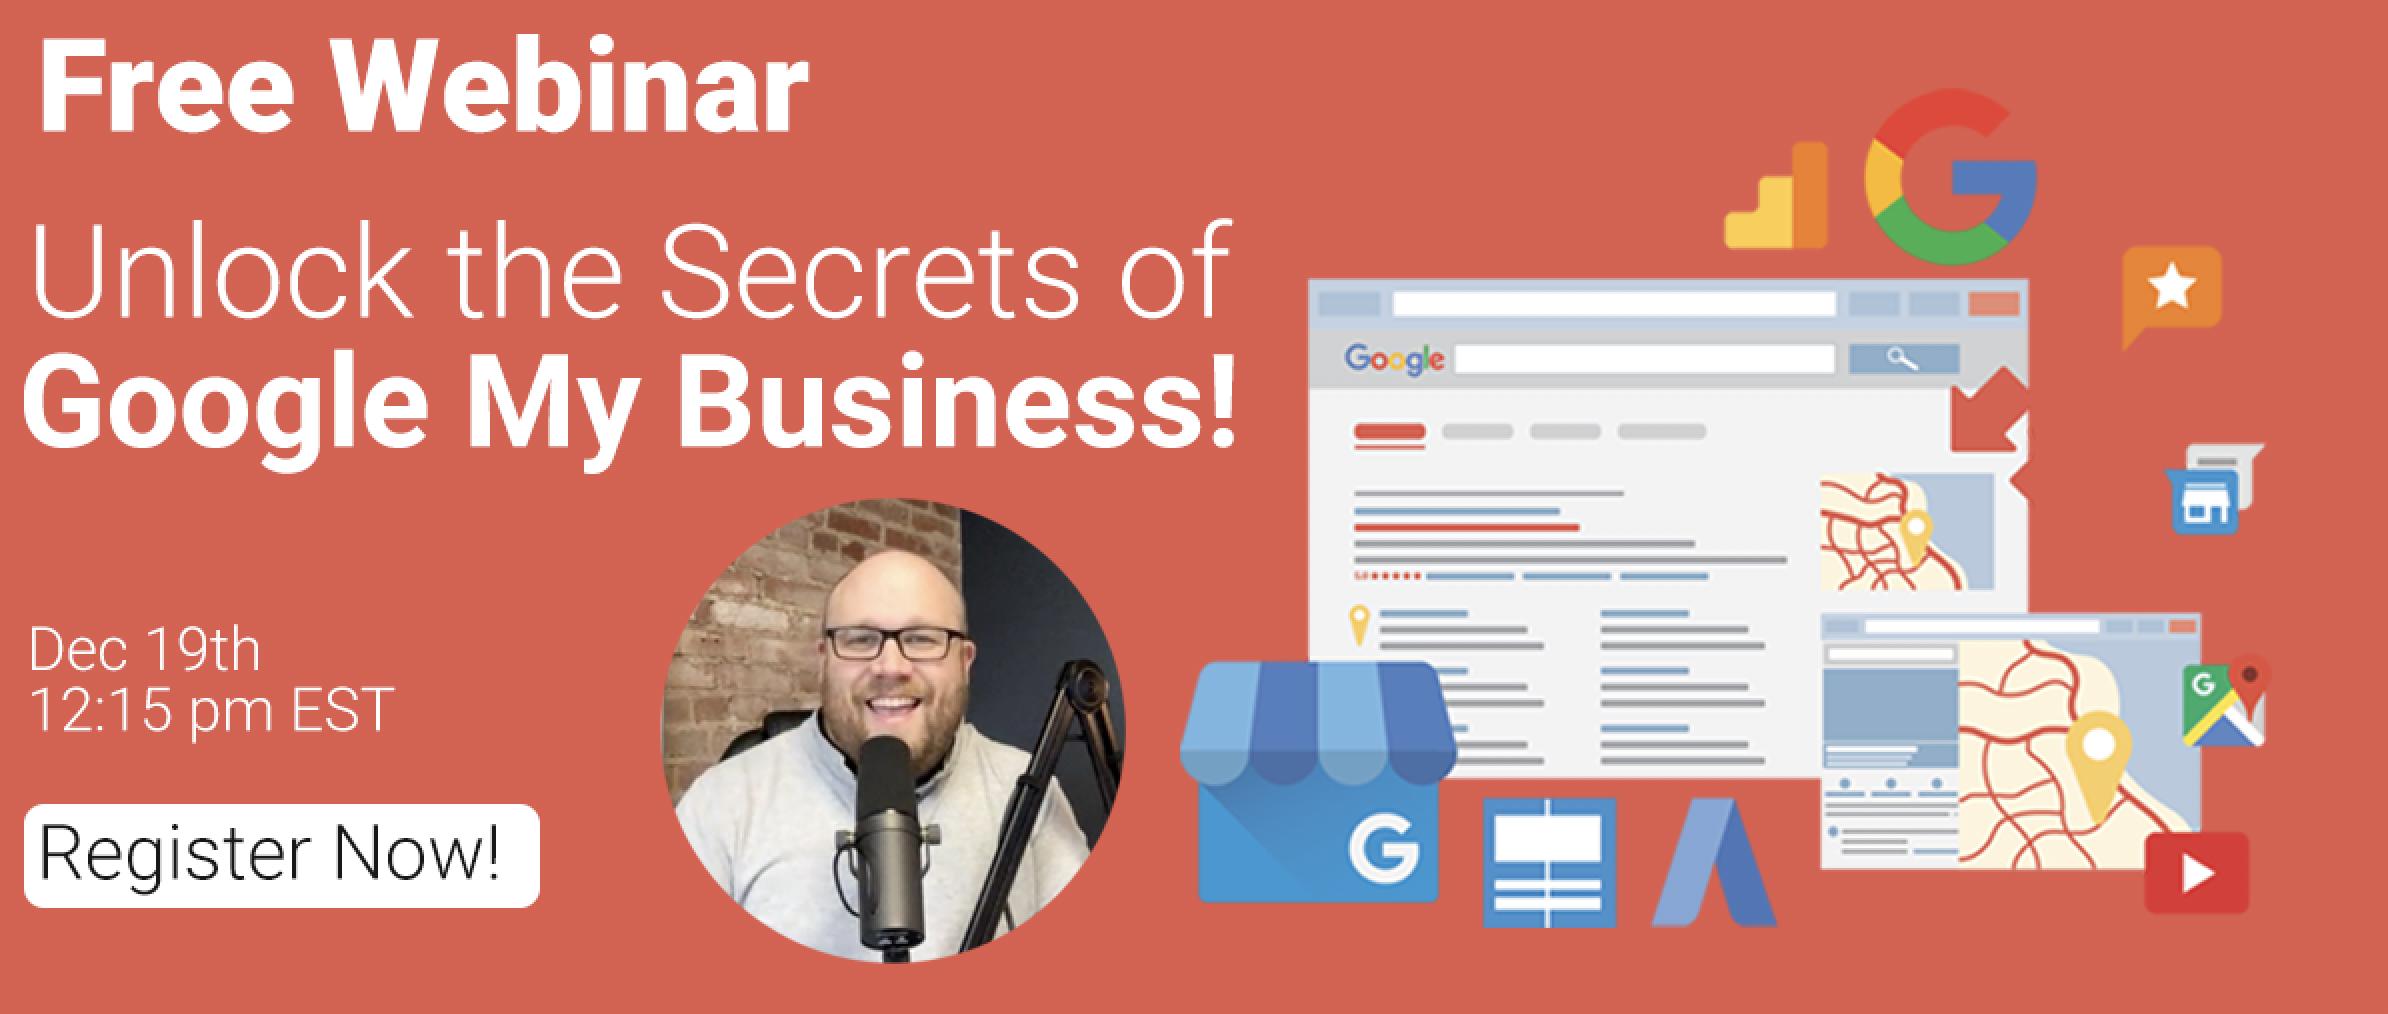 Unlock The Secrets of Google My Business